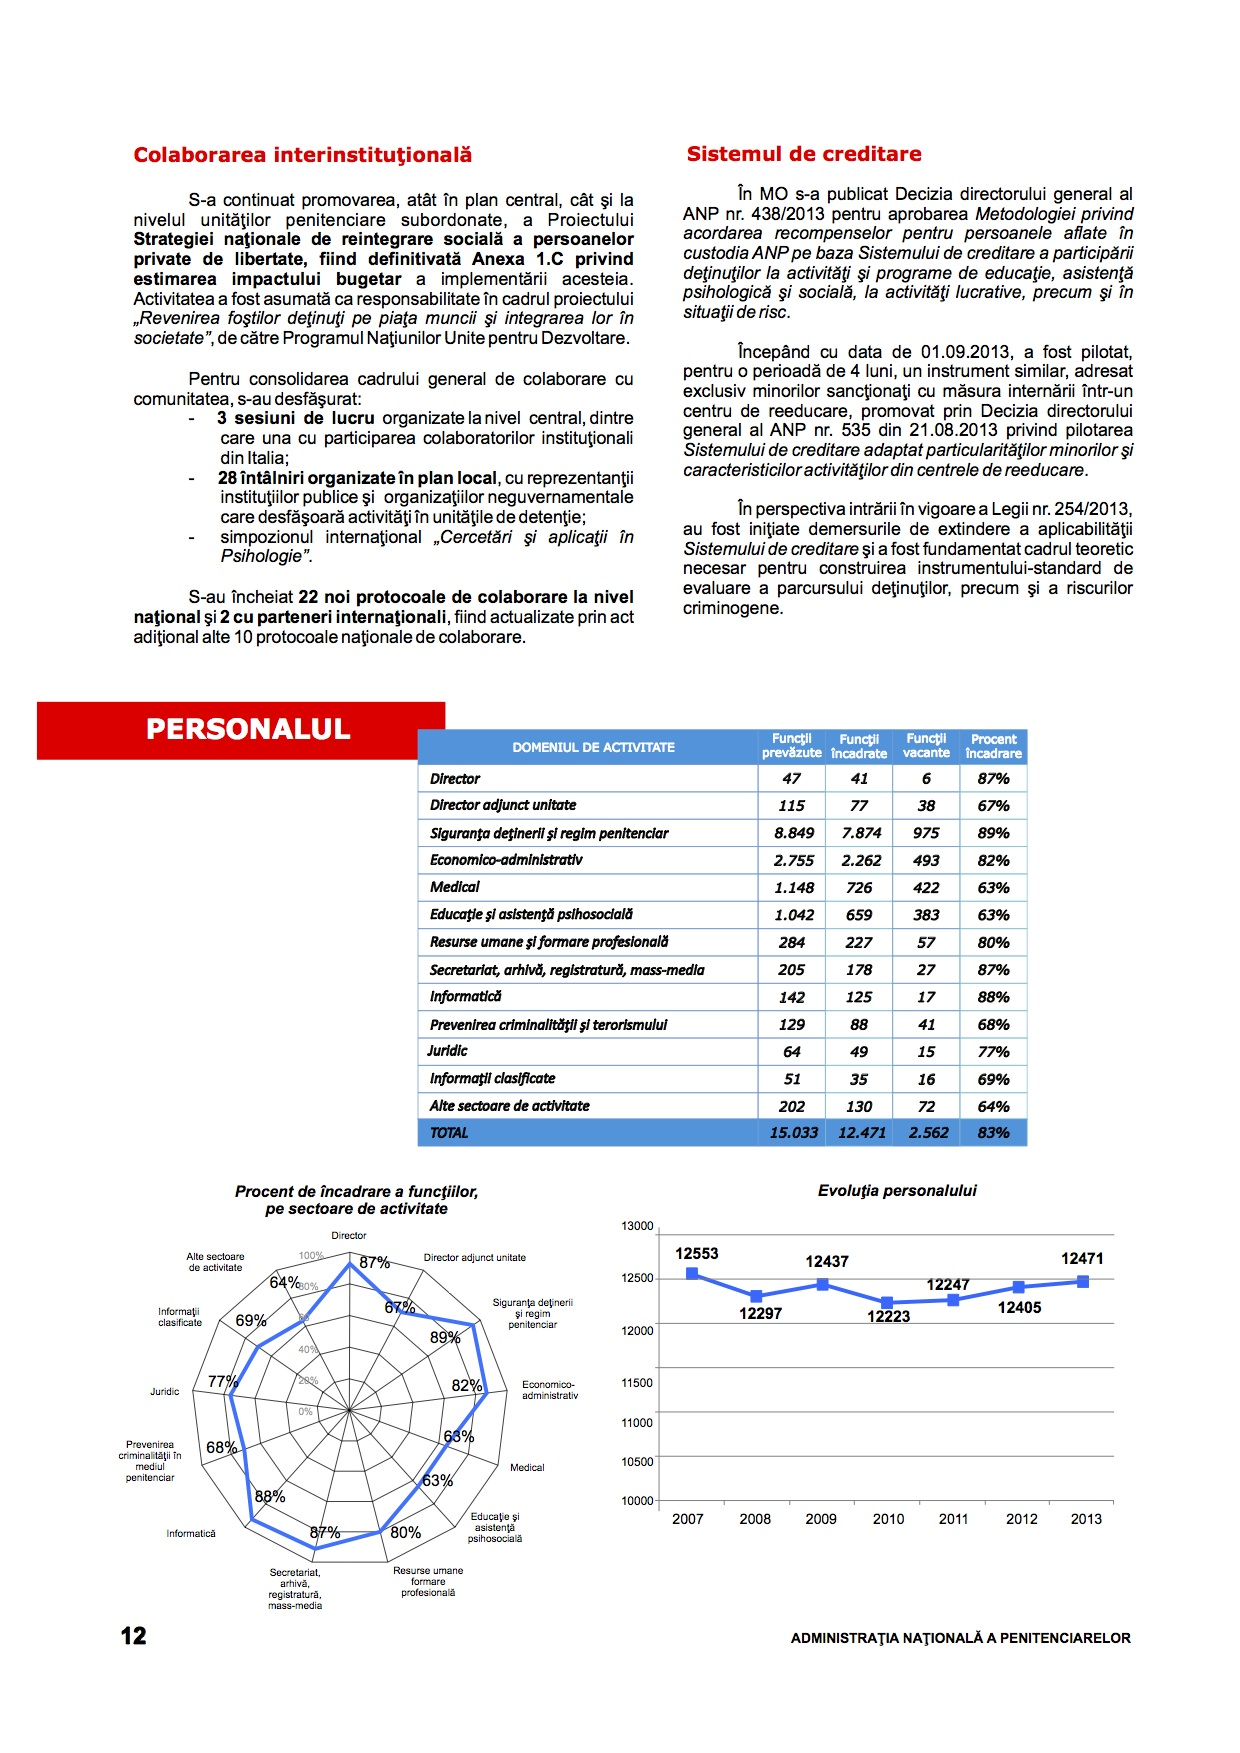 bilant 2013pg12